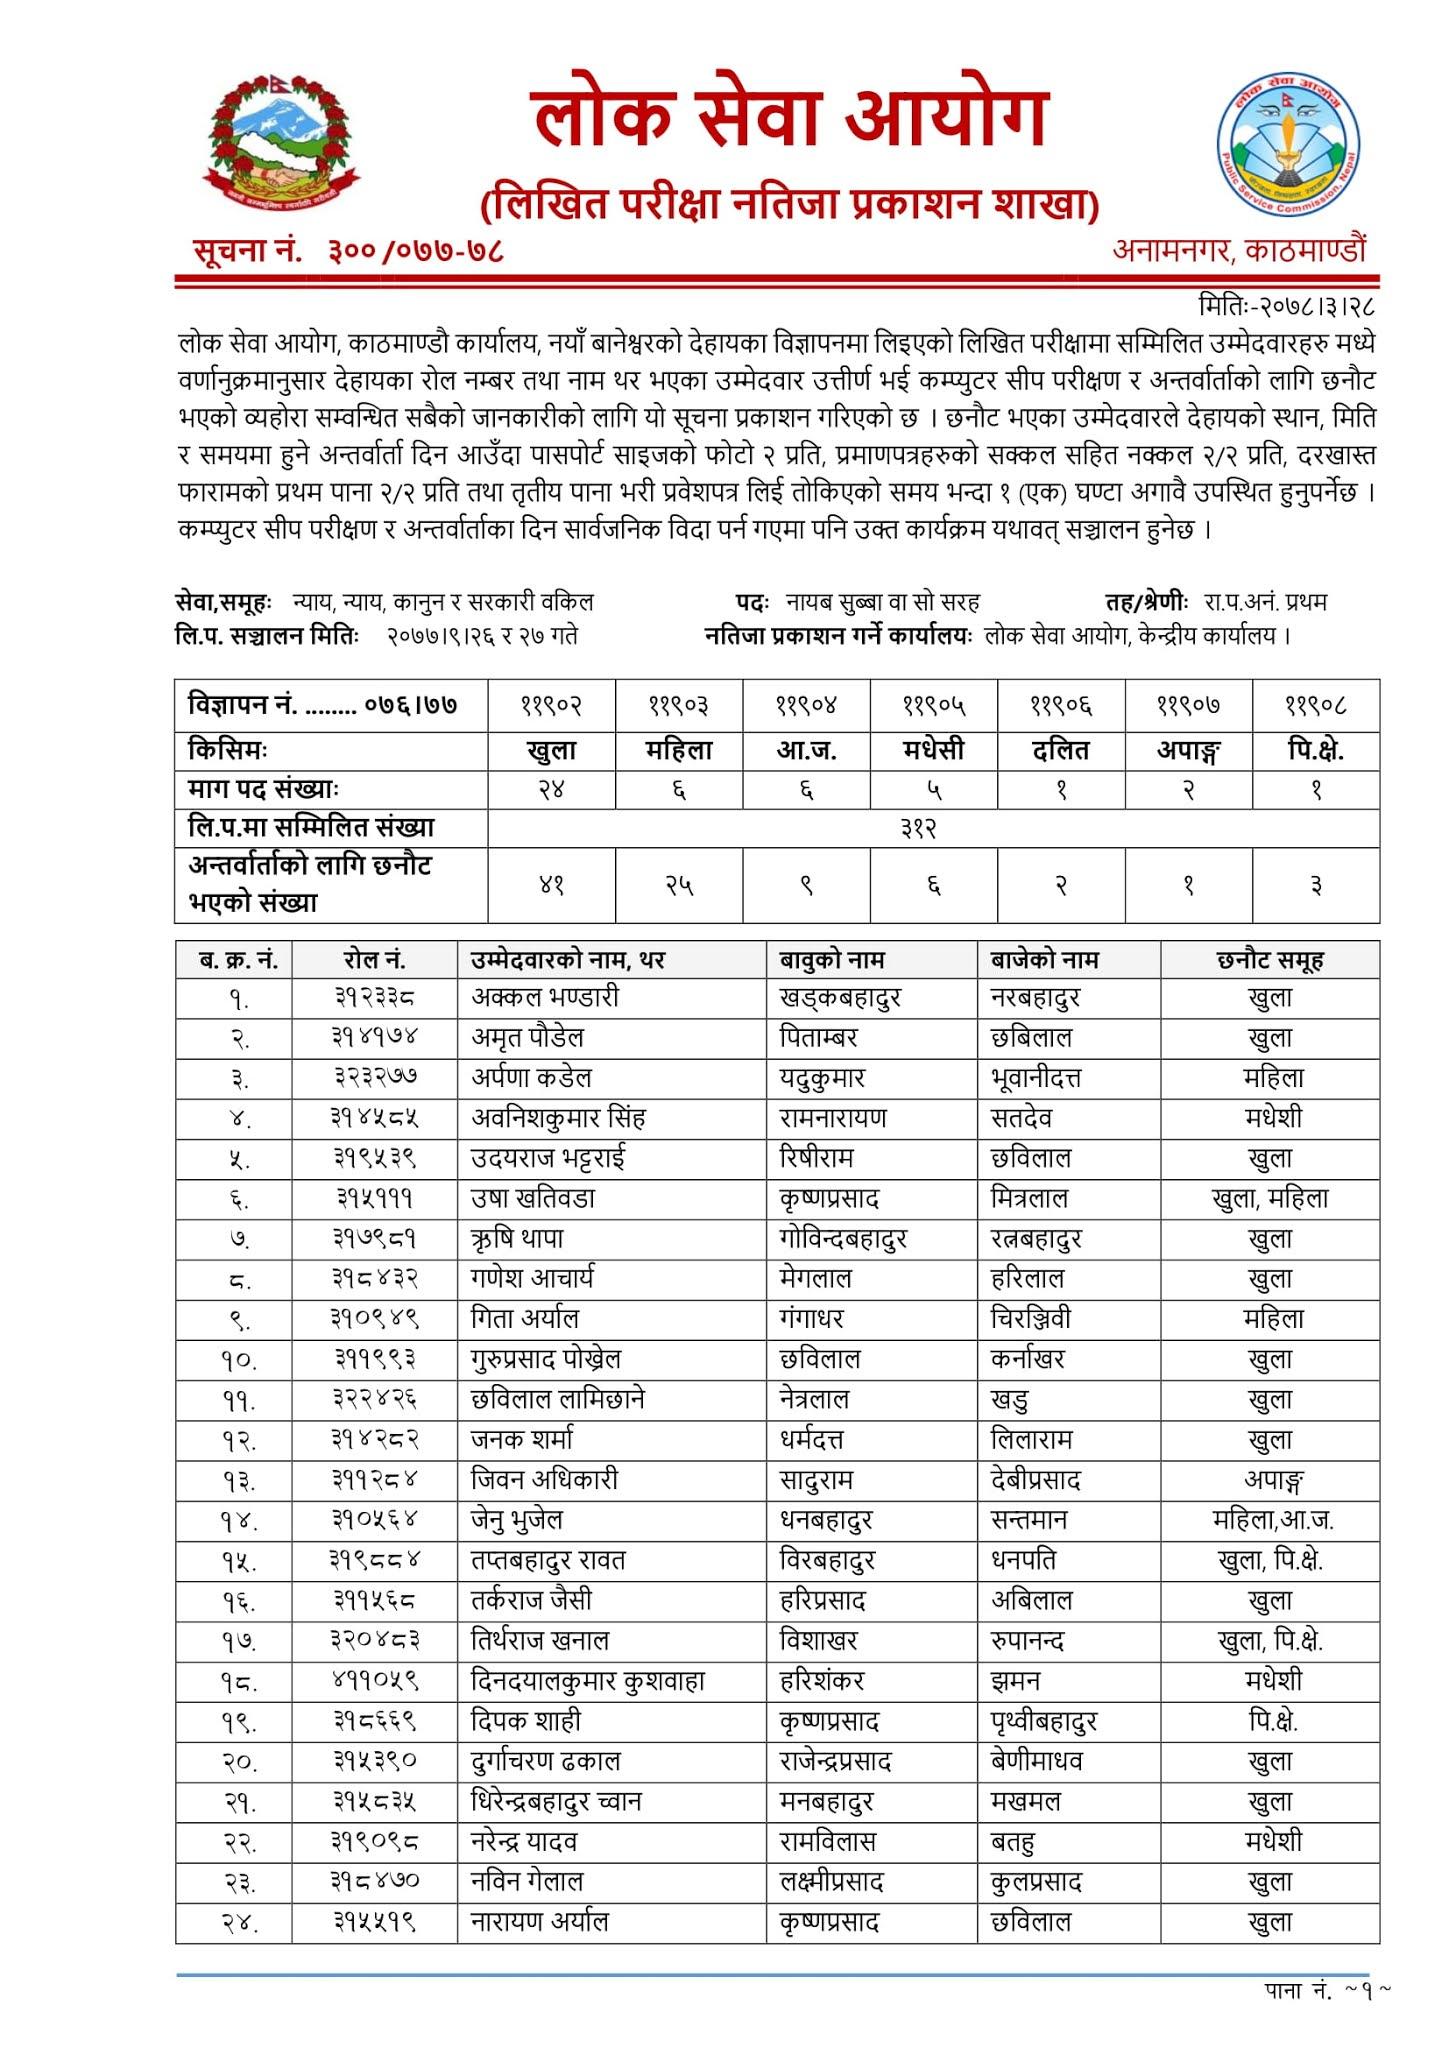 Lok Sewa Aayog Written Exam Result & Exam Schedule for NASU - Justice, Law and Public Prosecutor.